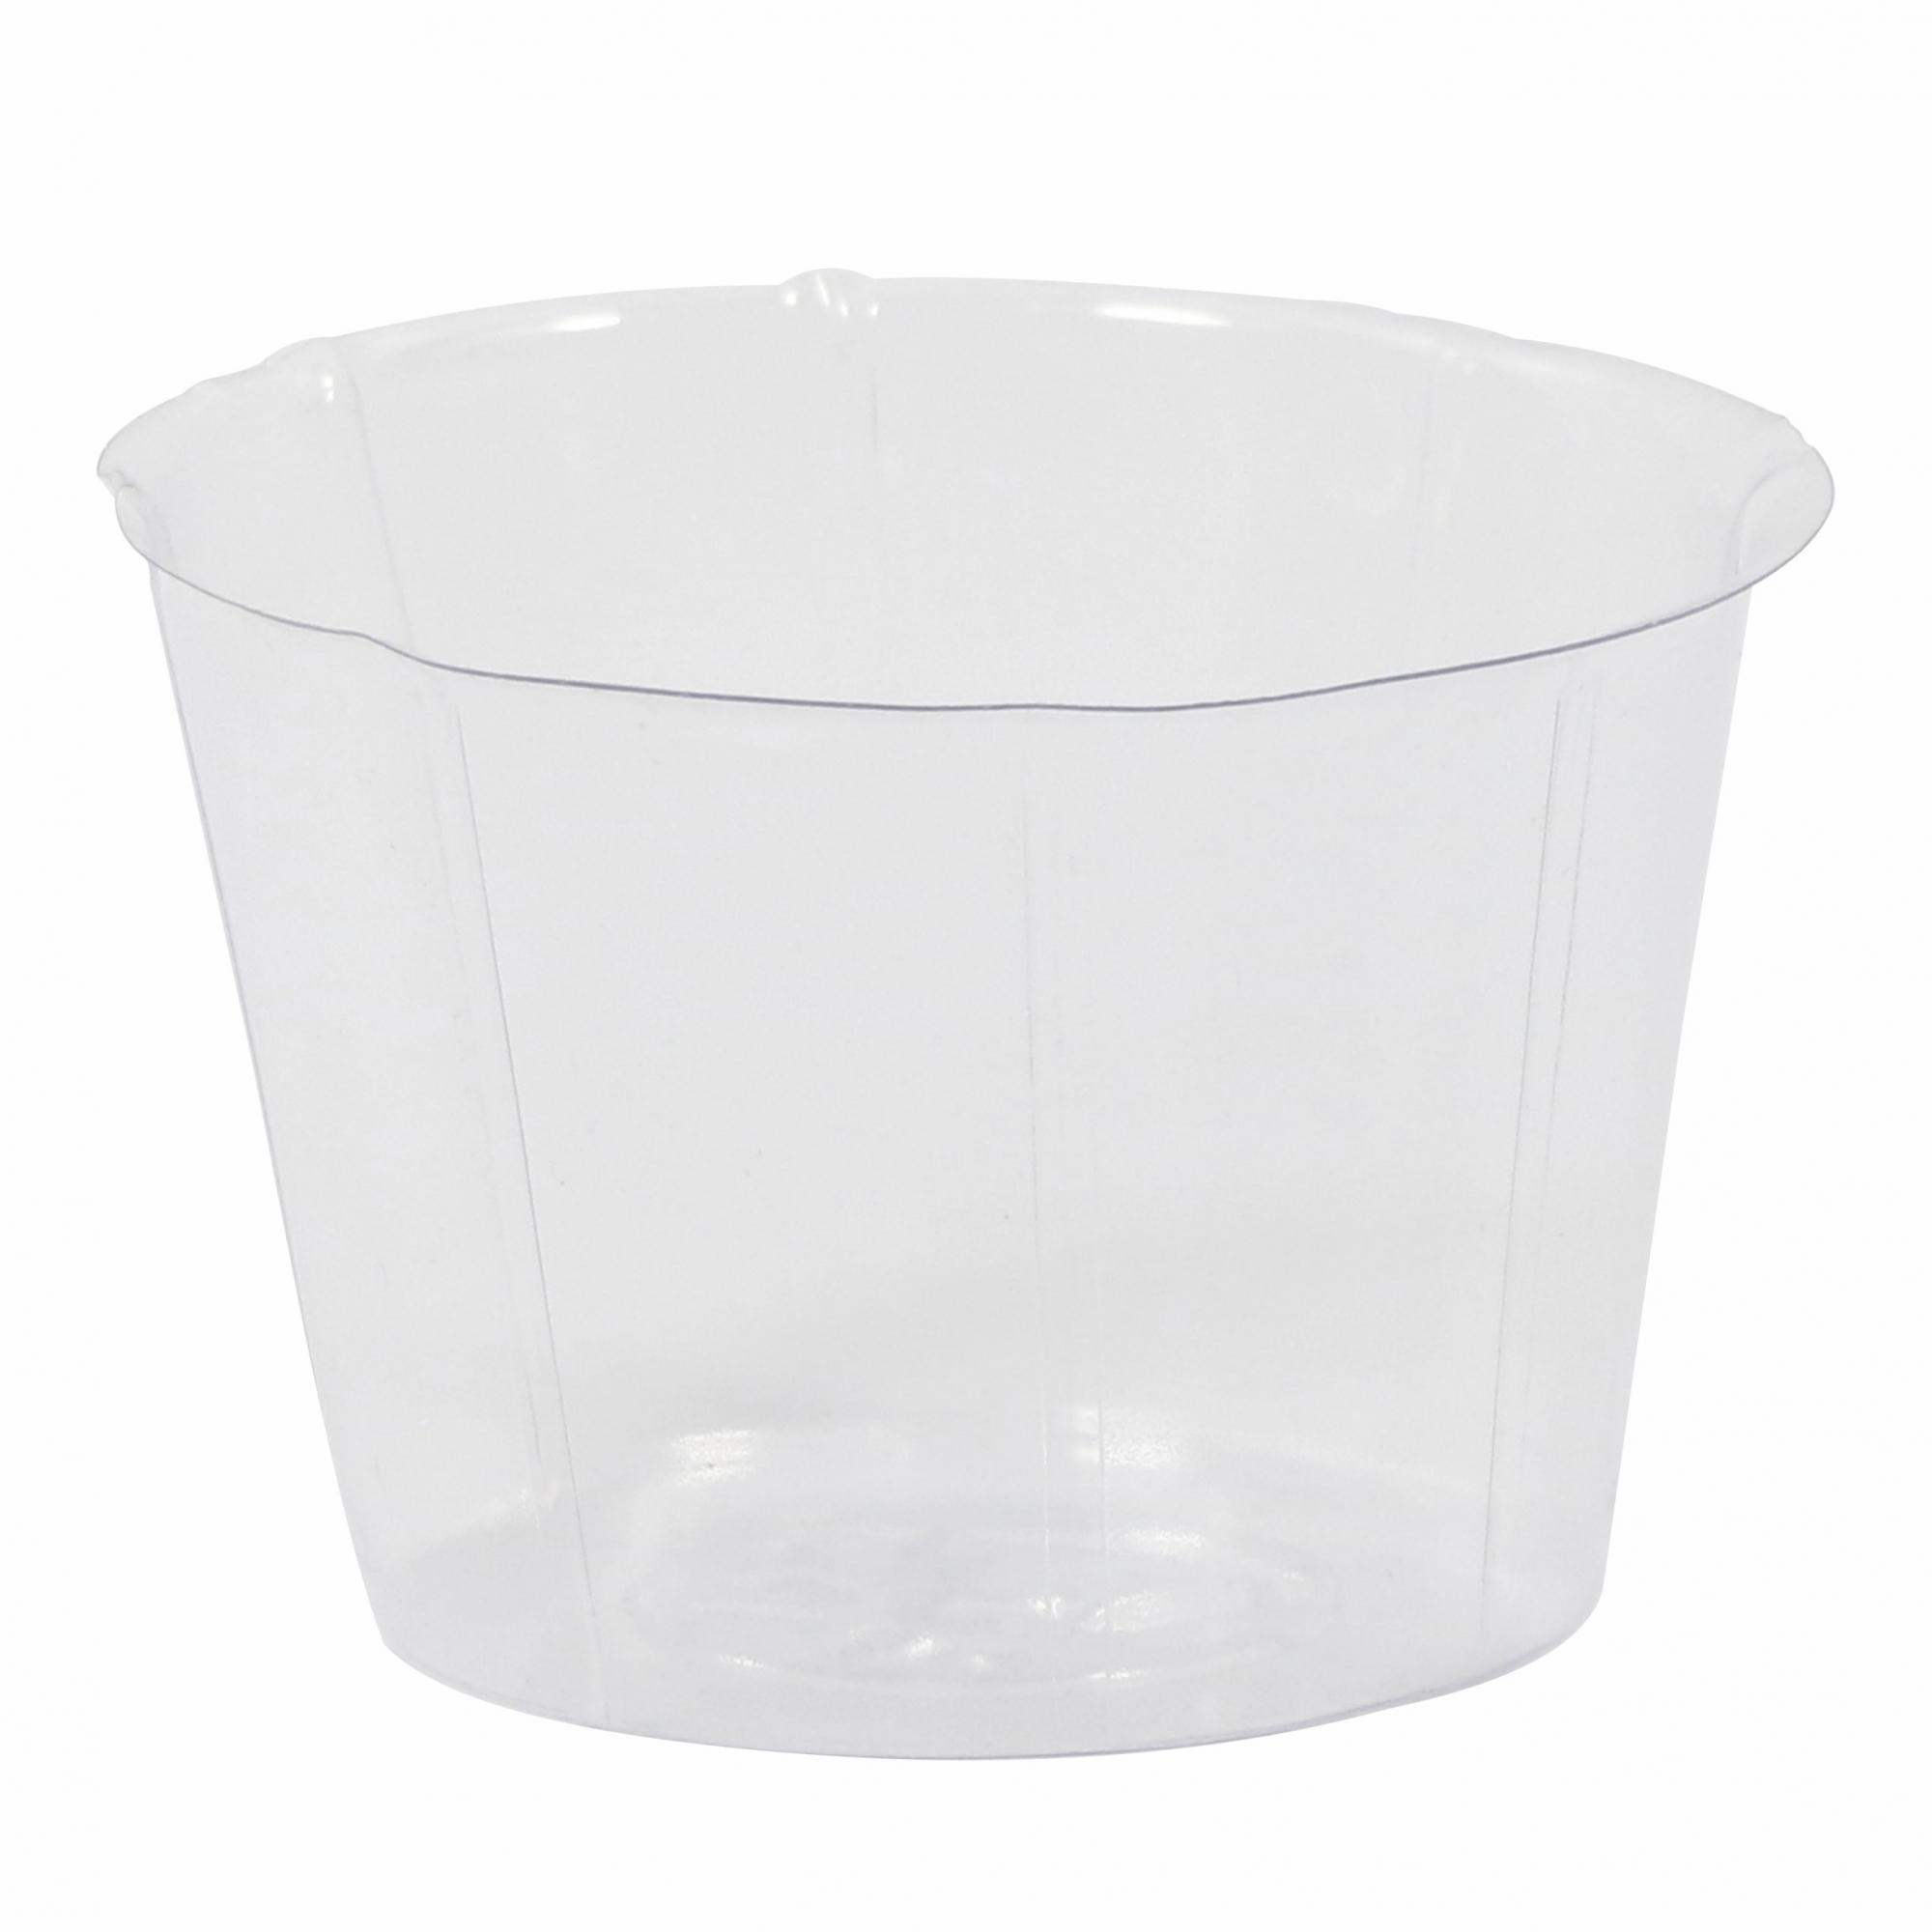 Cachepot de Plástico Transparente Inlay 11x18cm